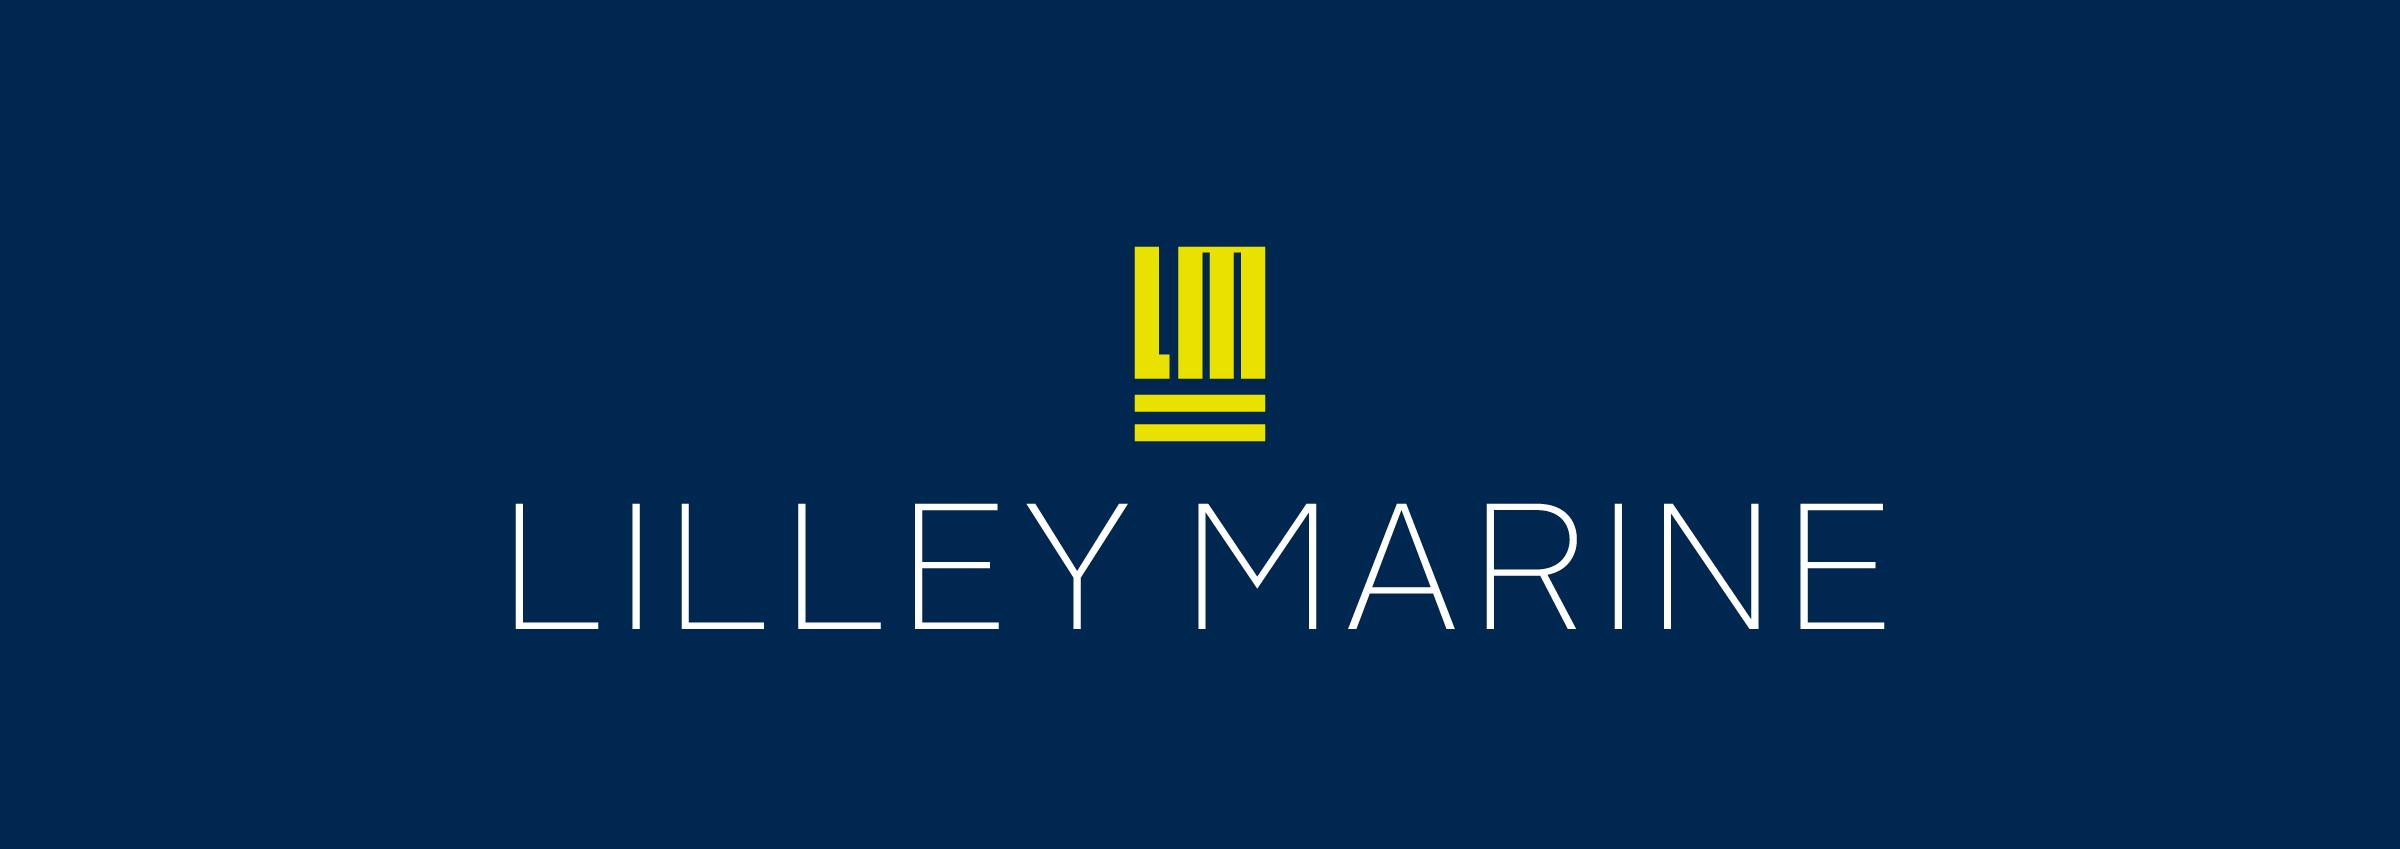 Lilley Marine 2018